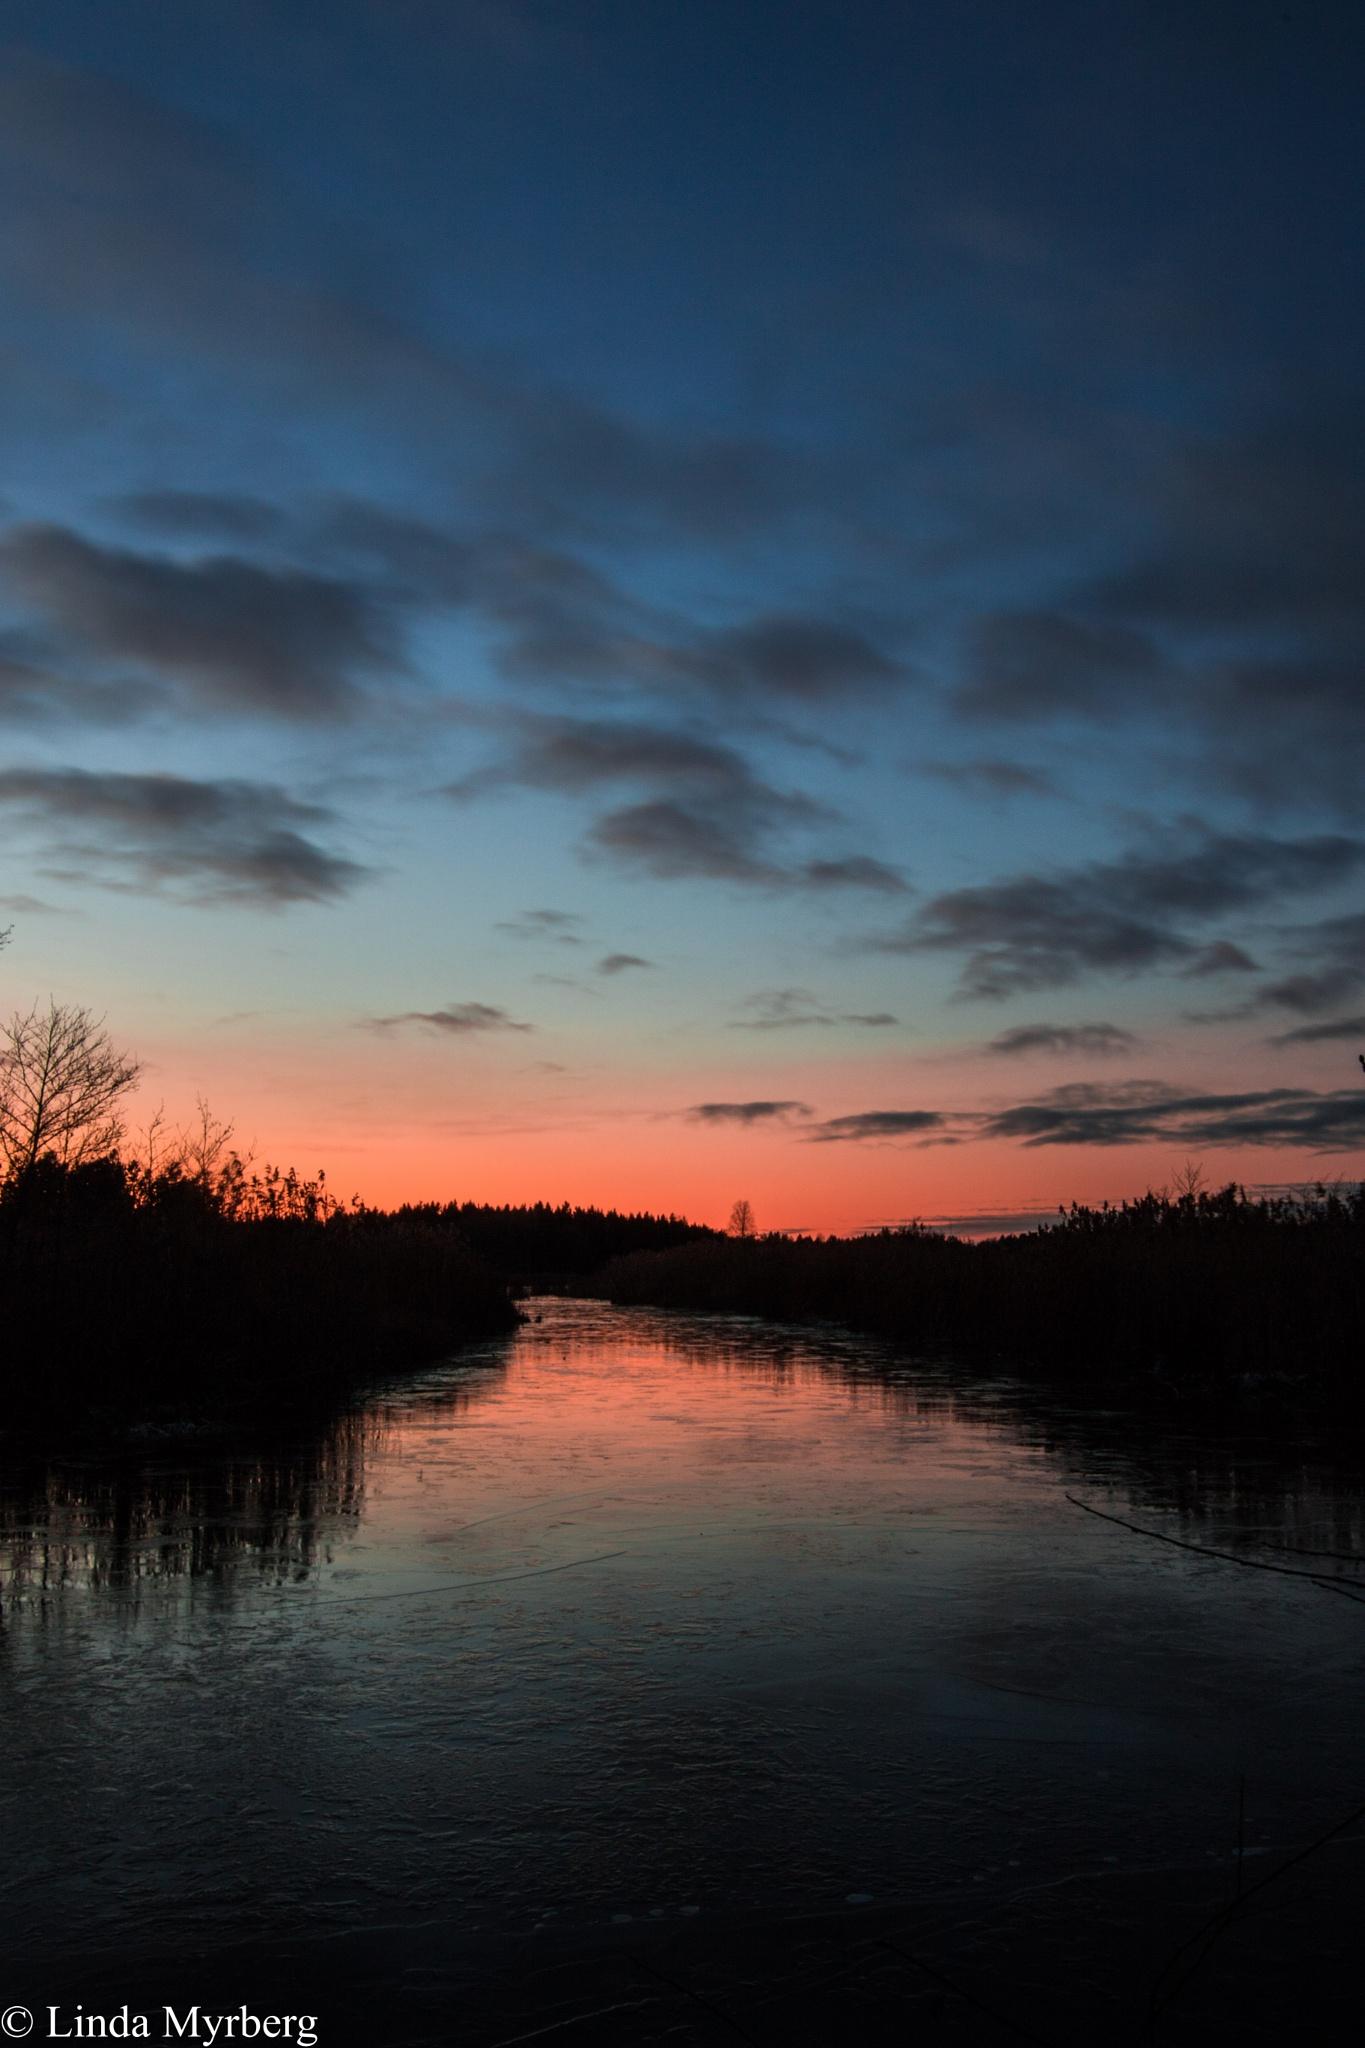 Sunset over Måsnaren part2 by Linda Myrberg